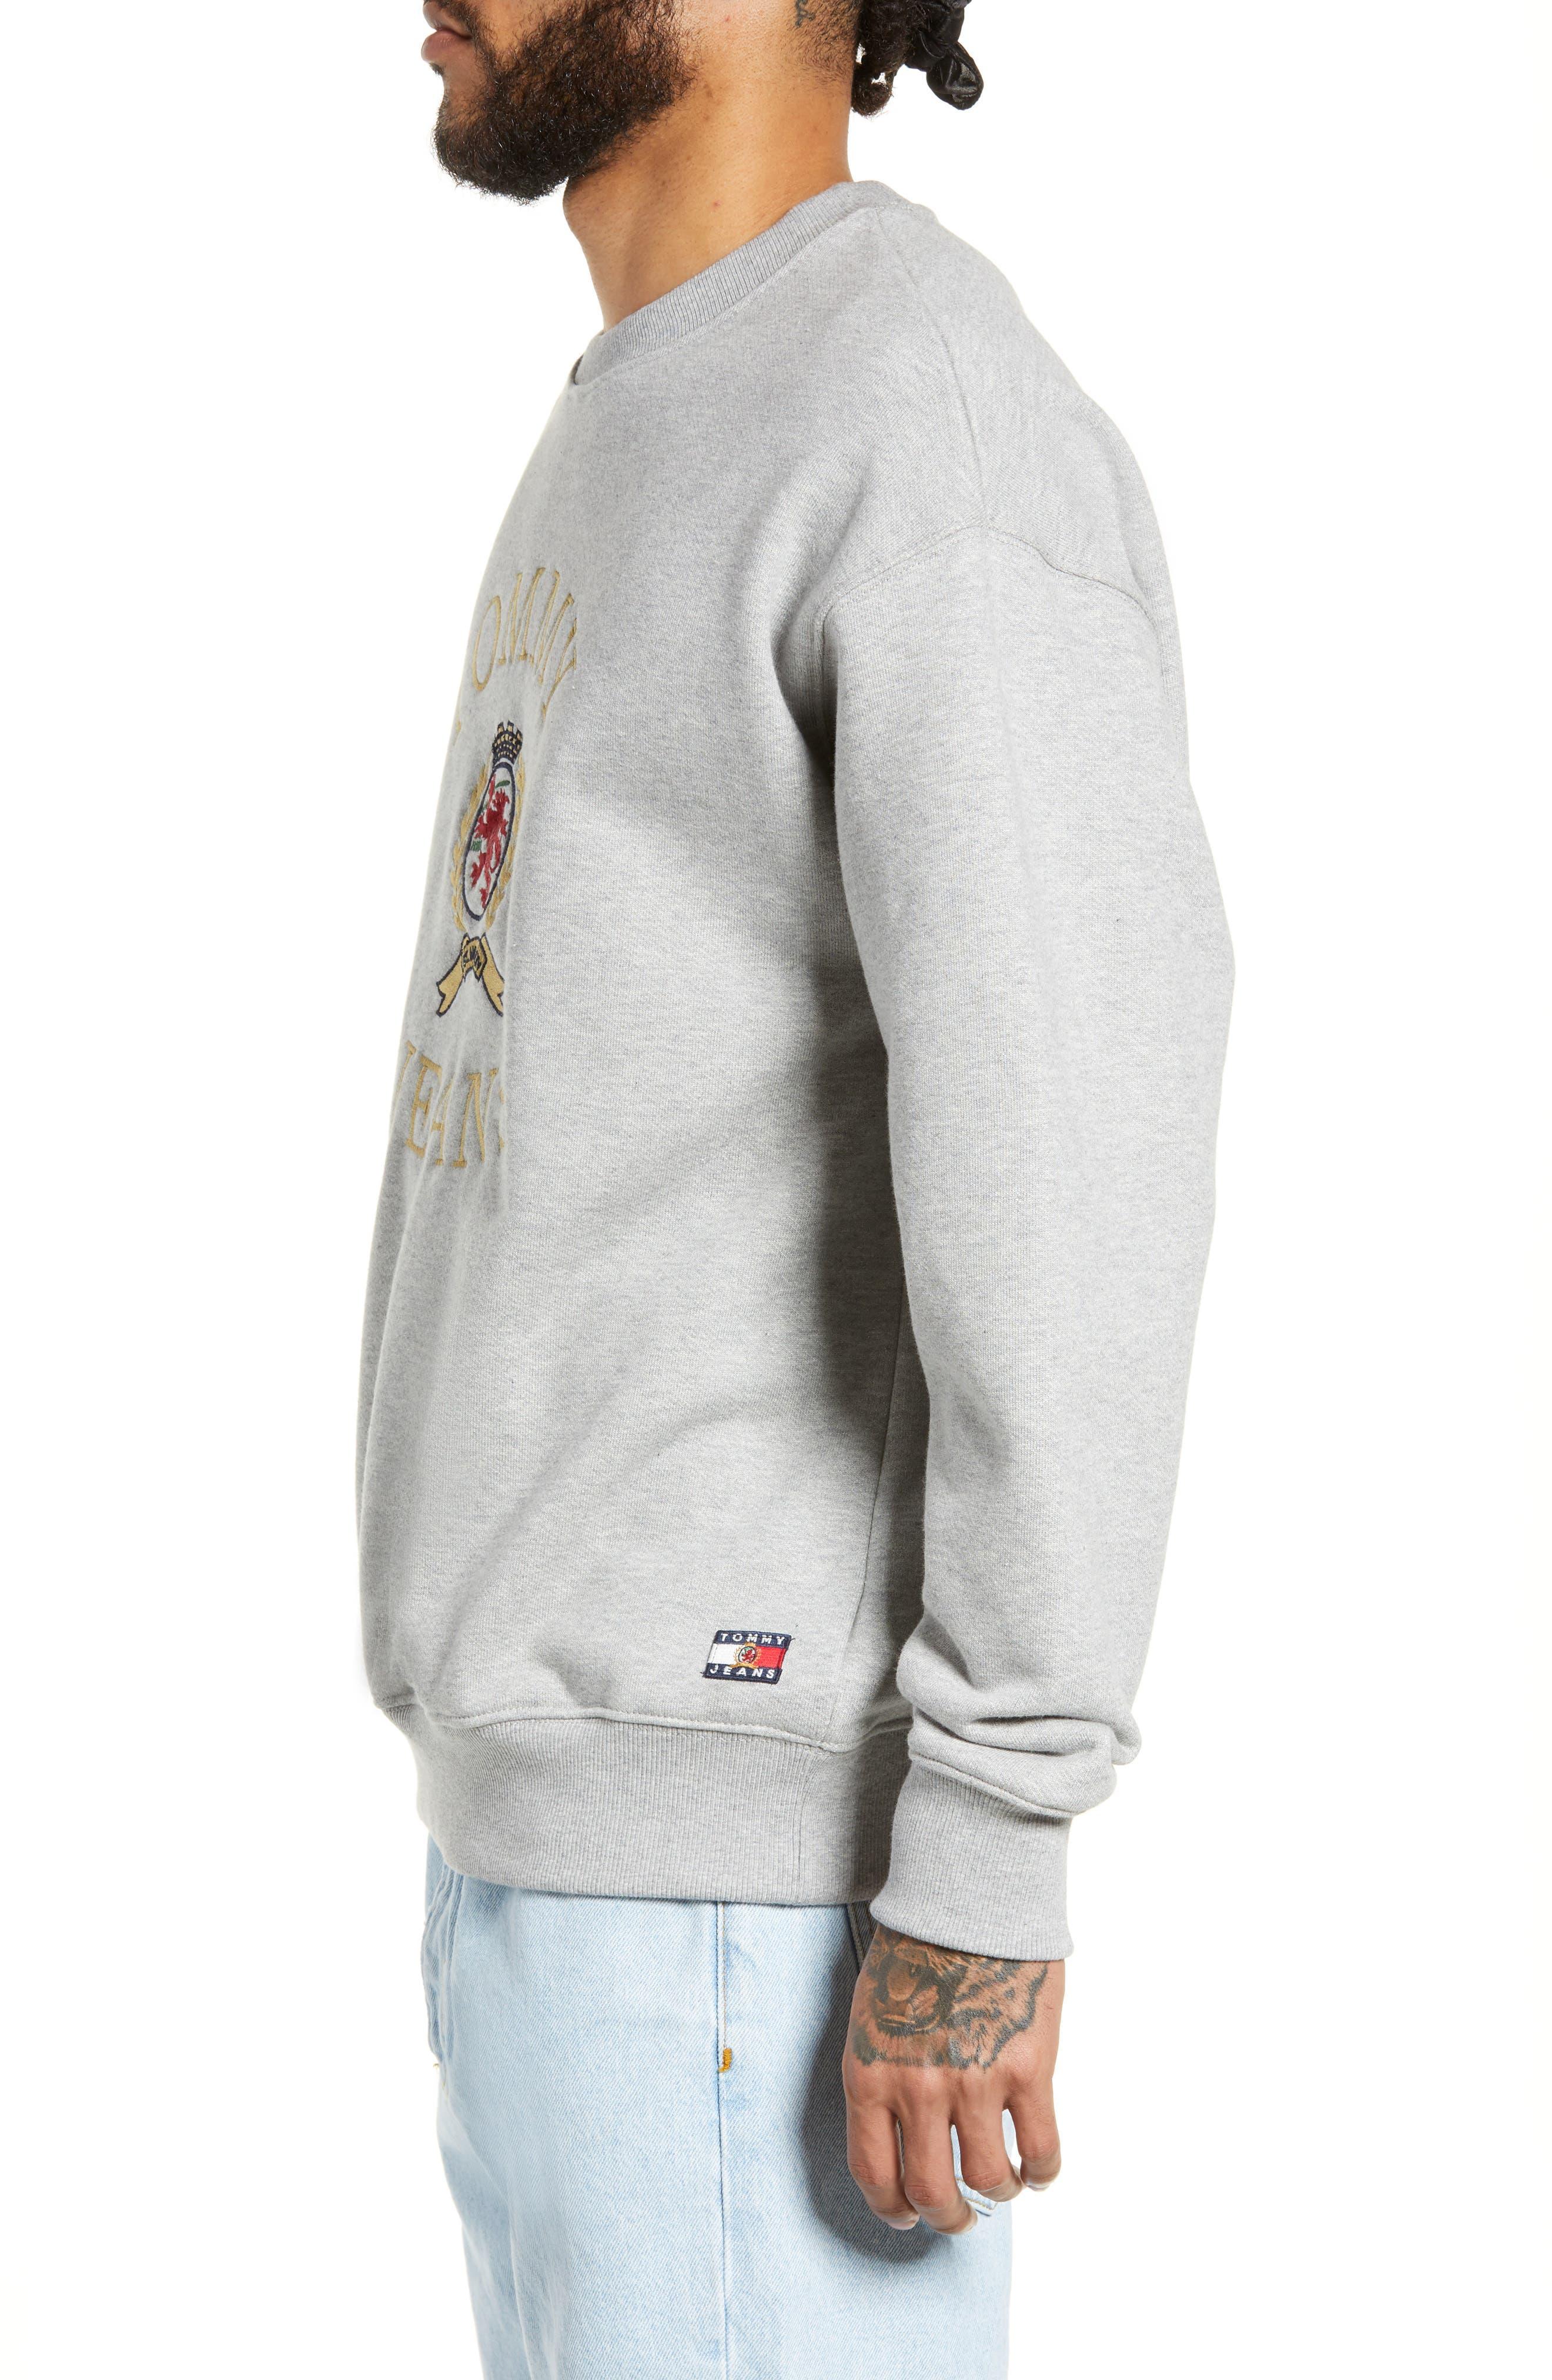 Embroidered Crest Sweatshirt,                             Alternate thumbnail 3, color,                             GREY HTR